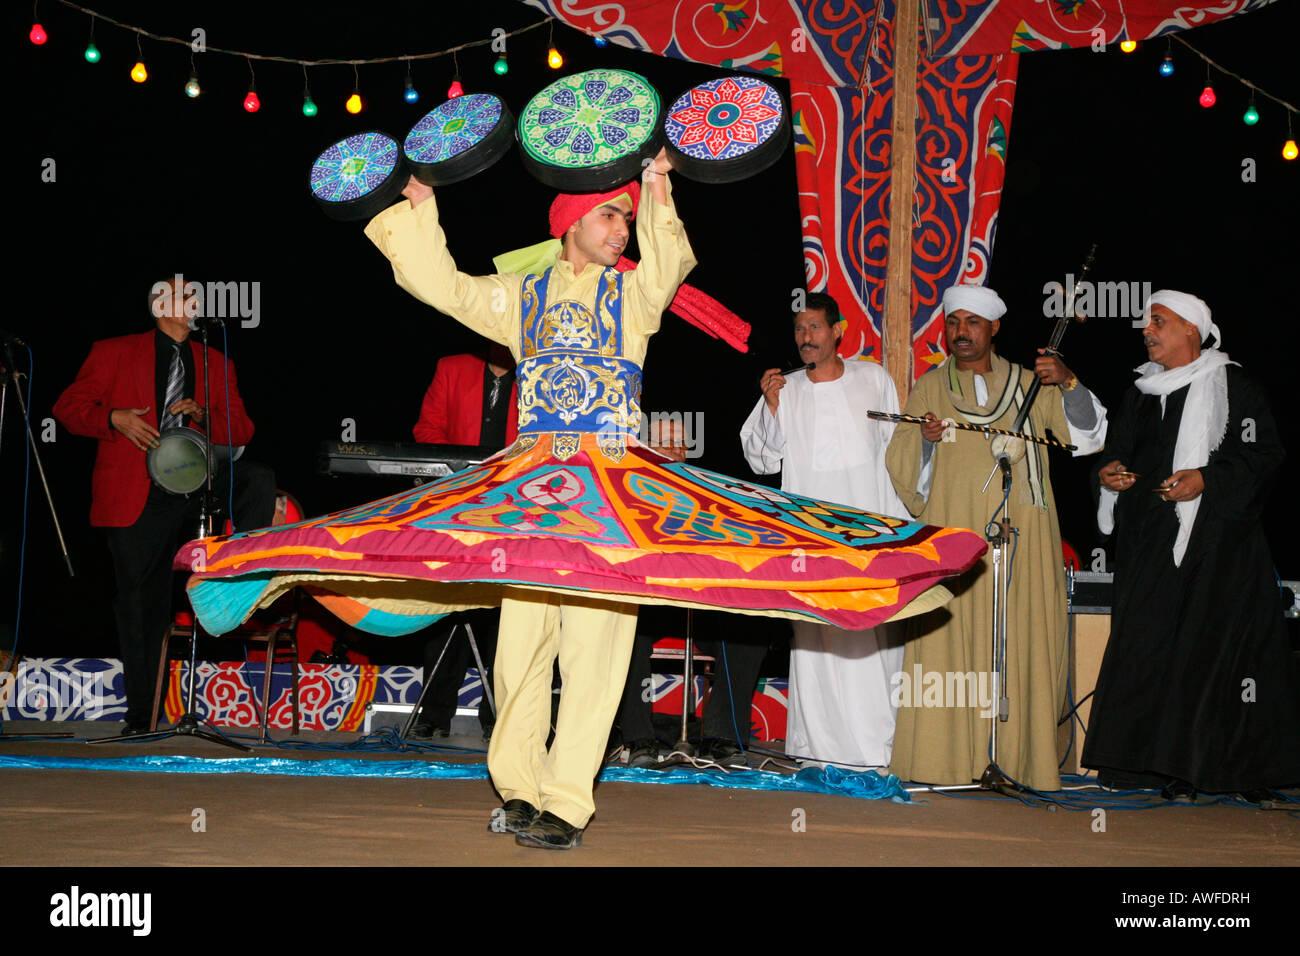 Dervish dancer, Sufis, Giza, Egypt, North Africa, Africa - Stock Image